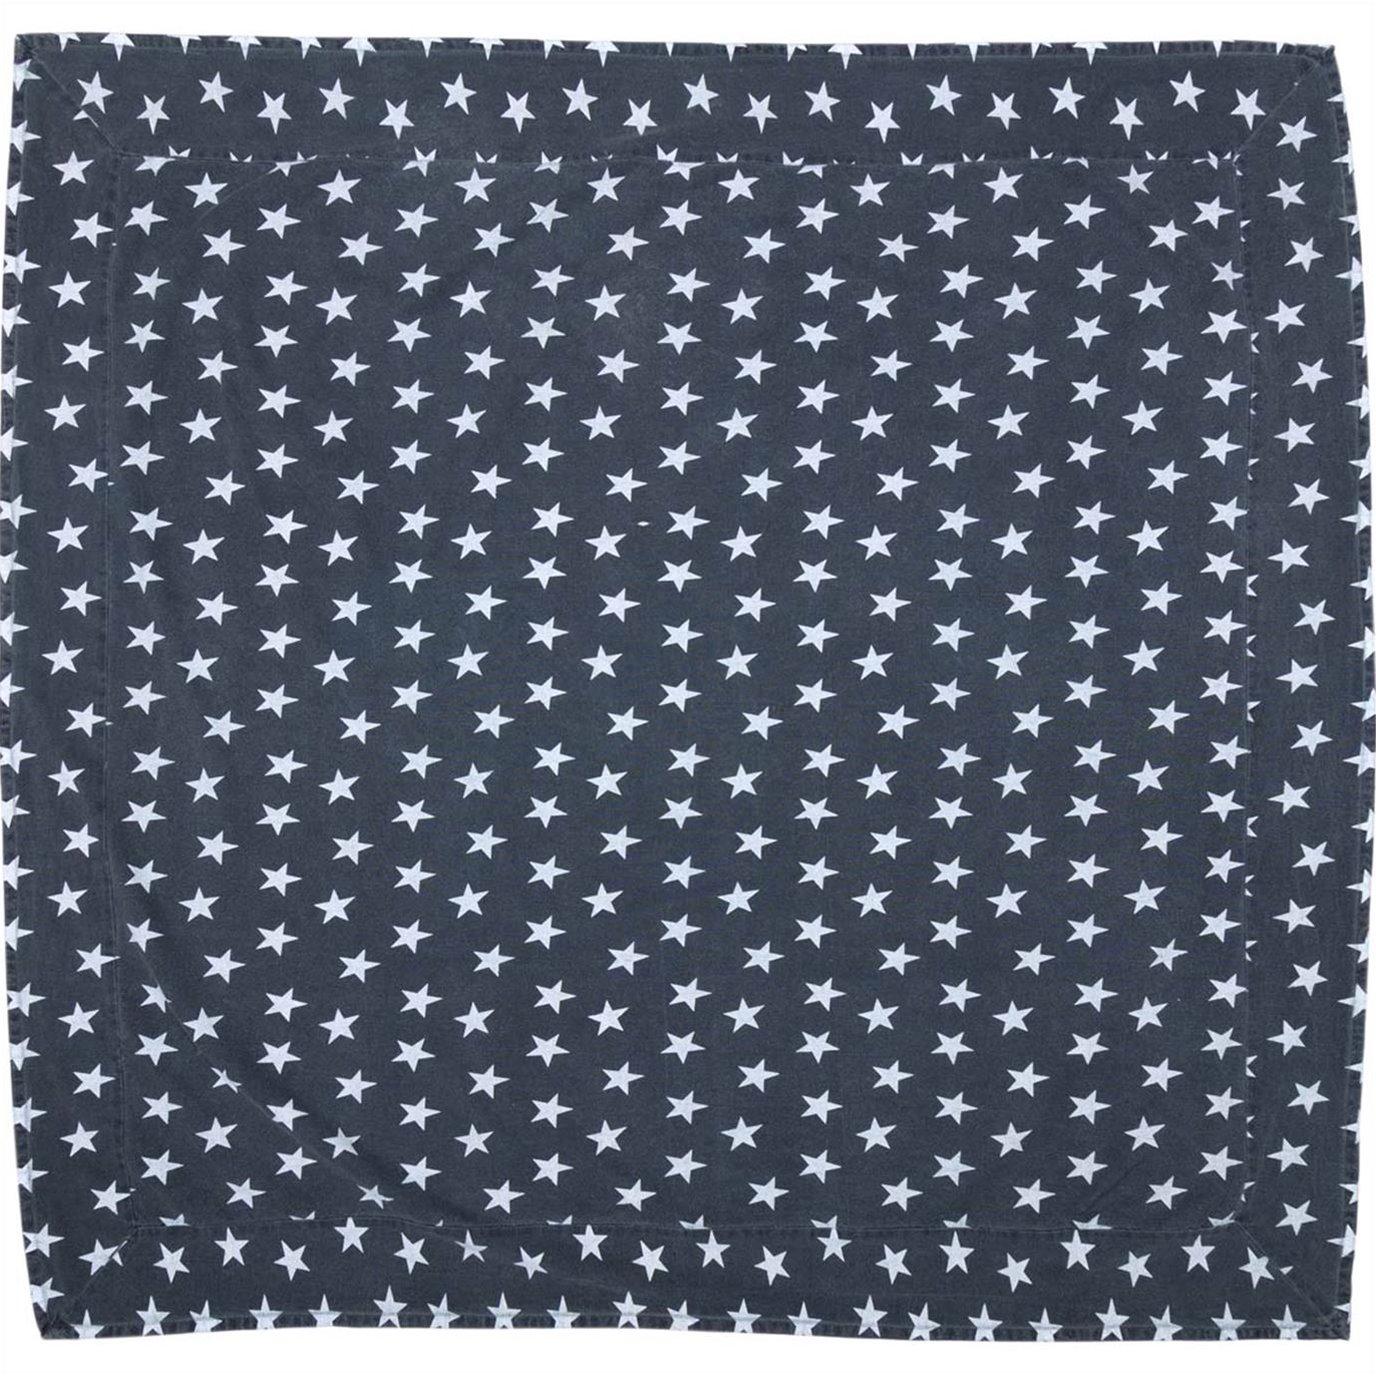 Multi Star Navy Table Cloth 60x60